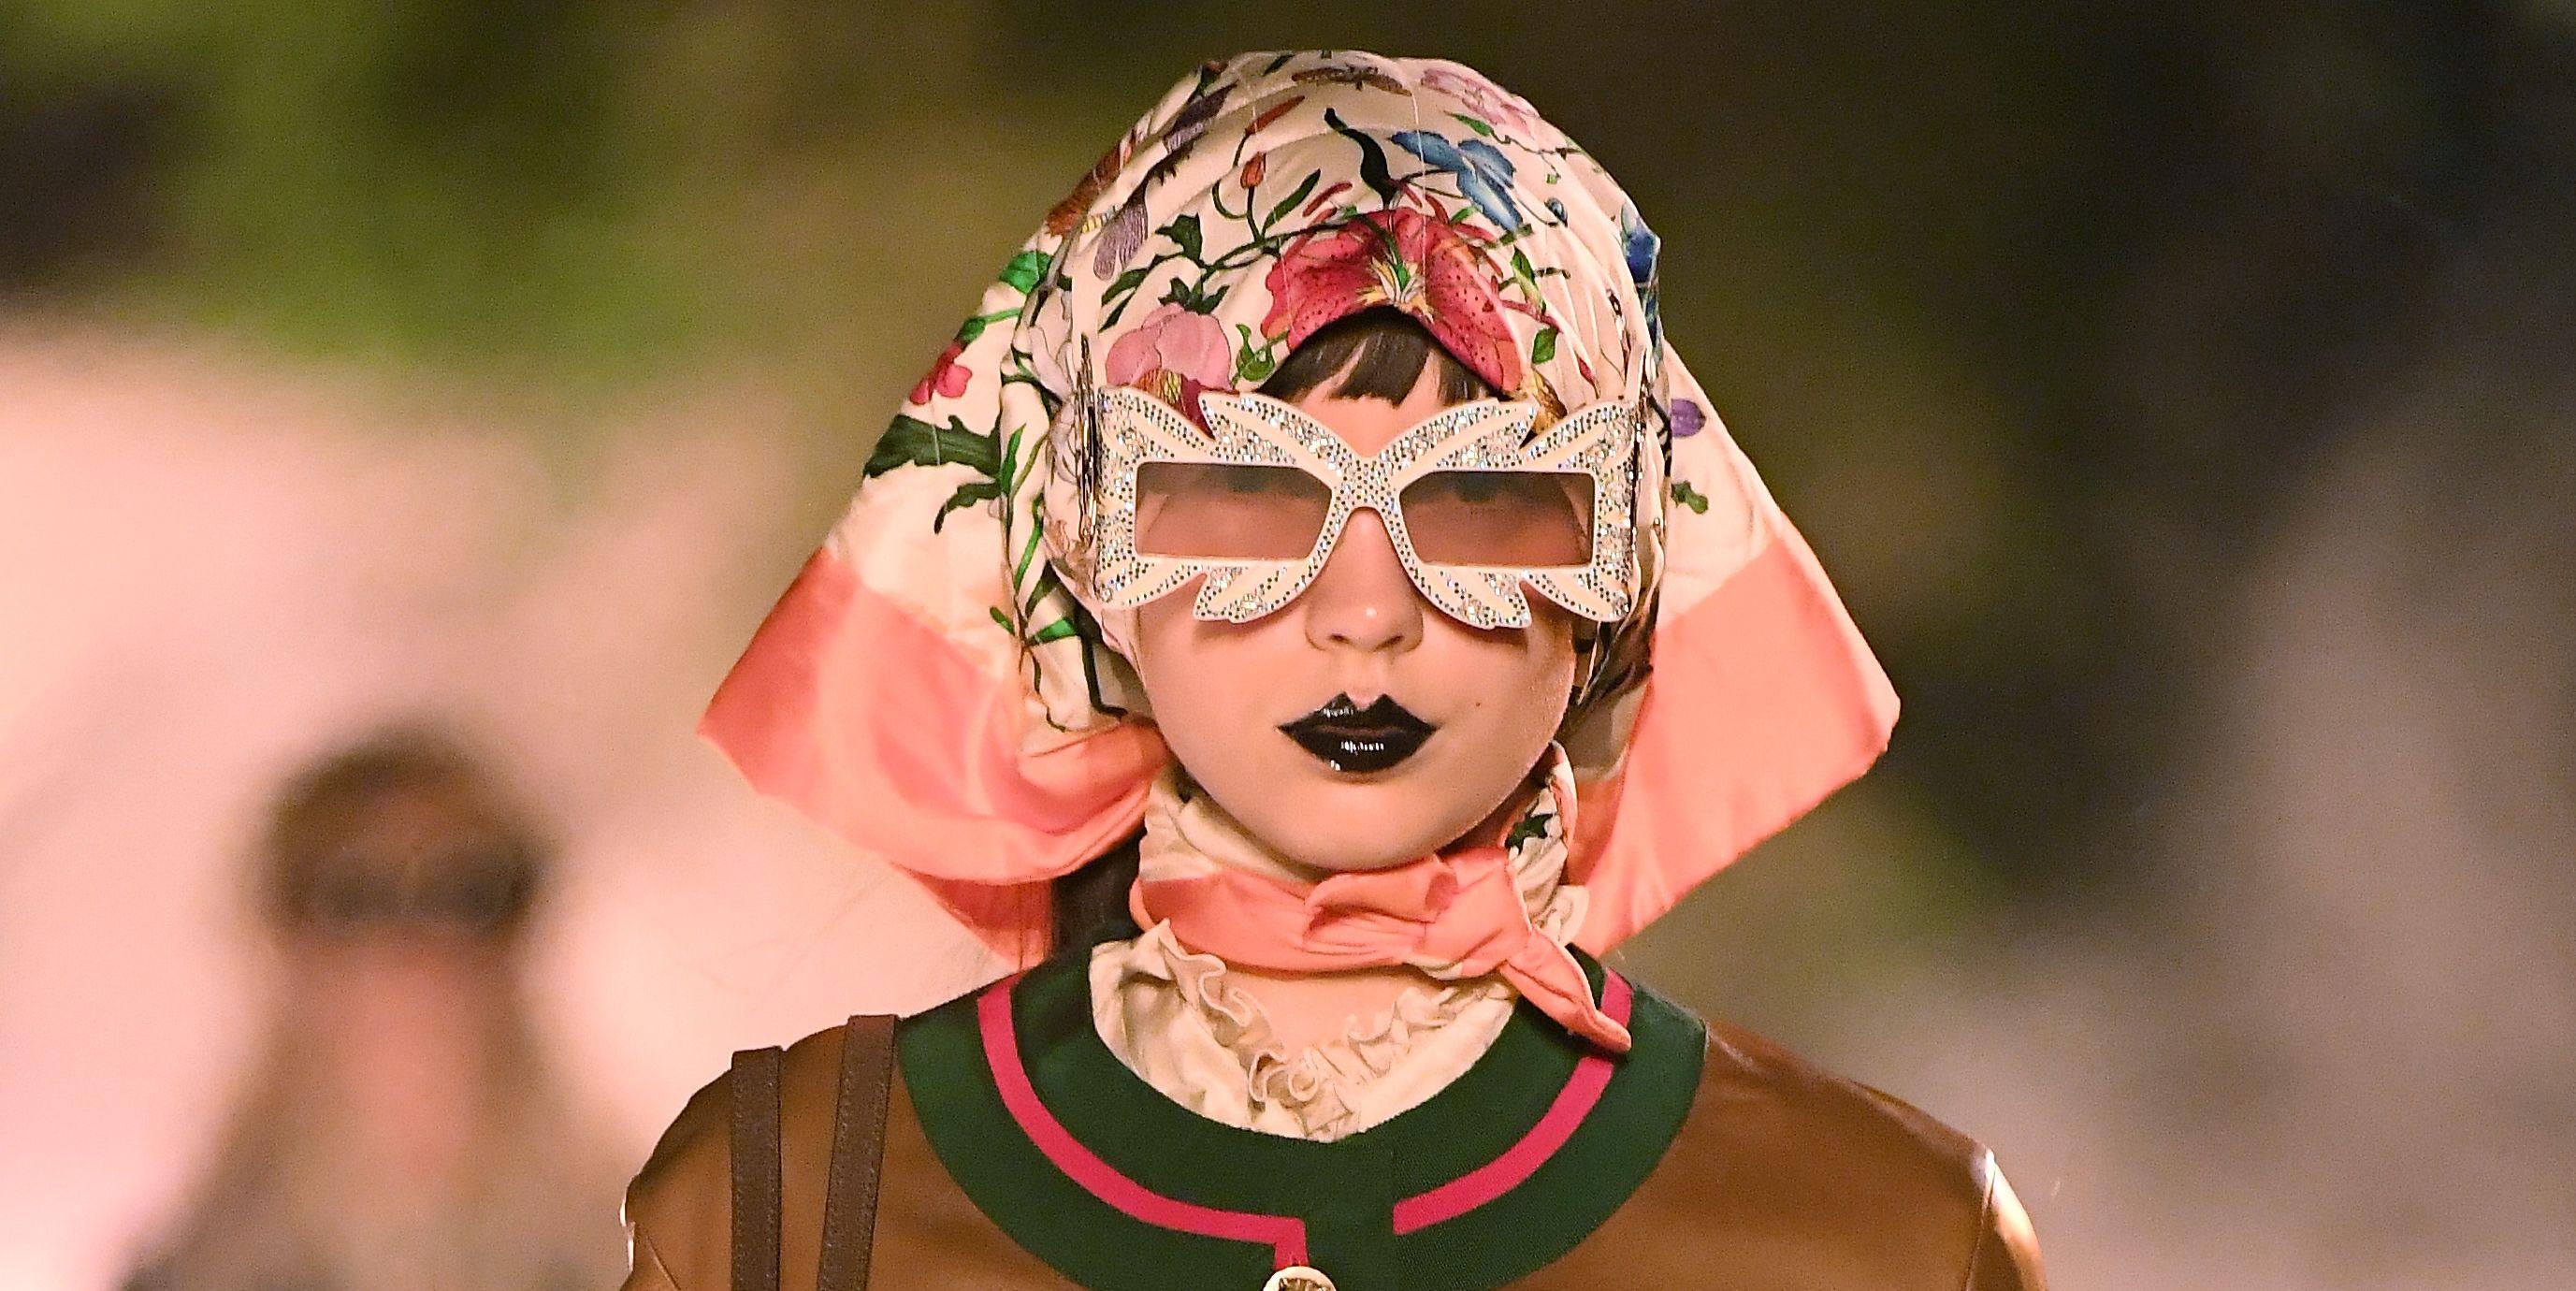 hoofddoek-hijab-gucci-prada-mode-trend